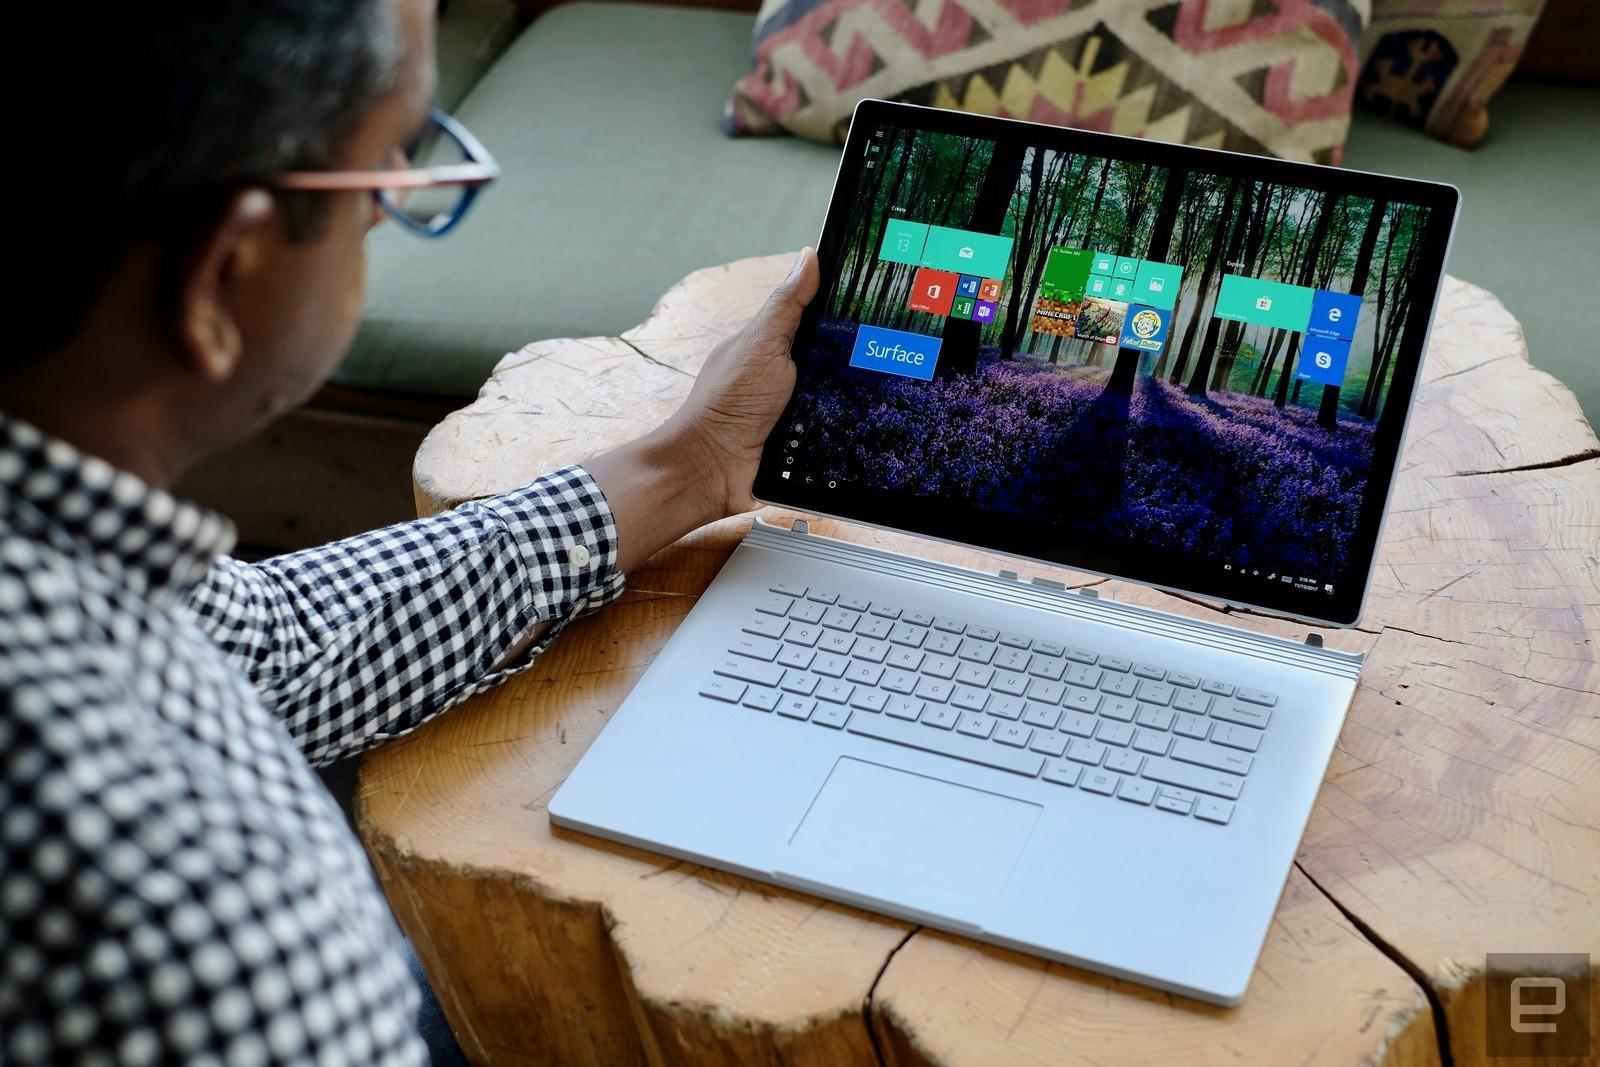 Windows 10 下一步更新重点将转向人工智能,人类或将步进AI时代